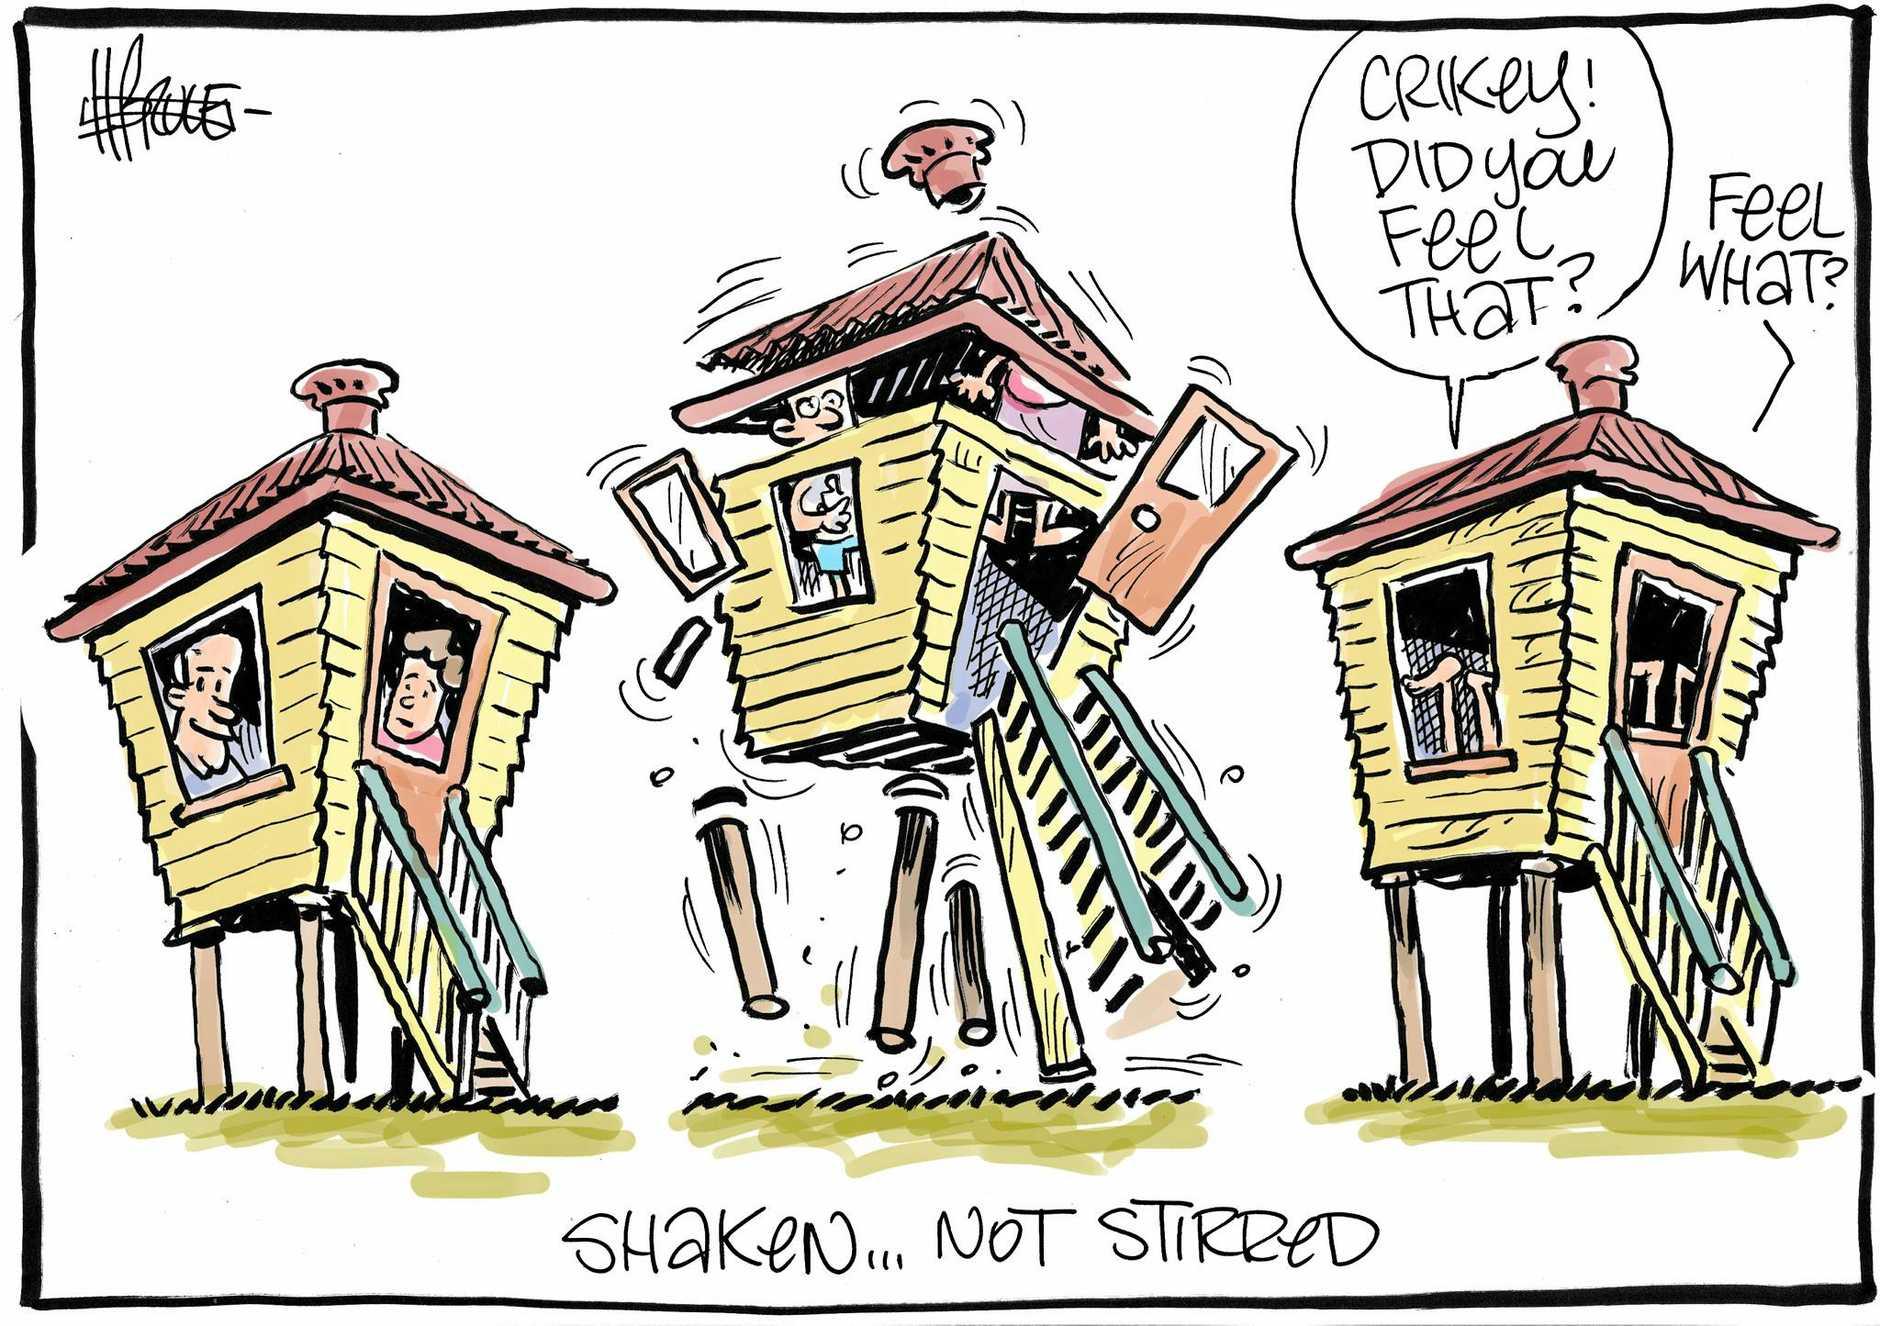 Cartoon by Harry Bruce.